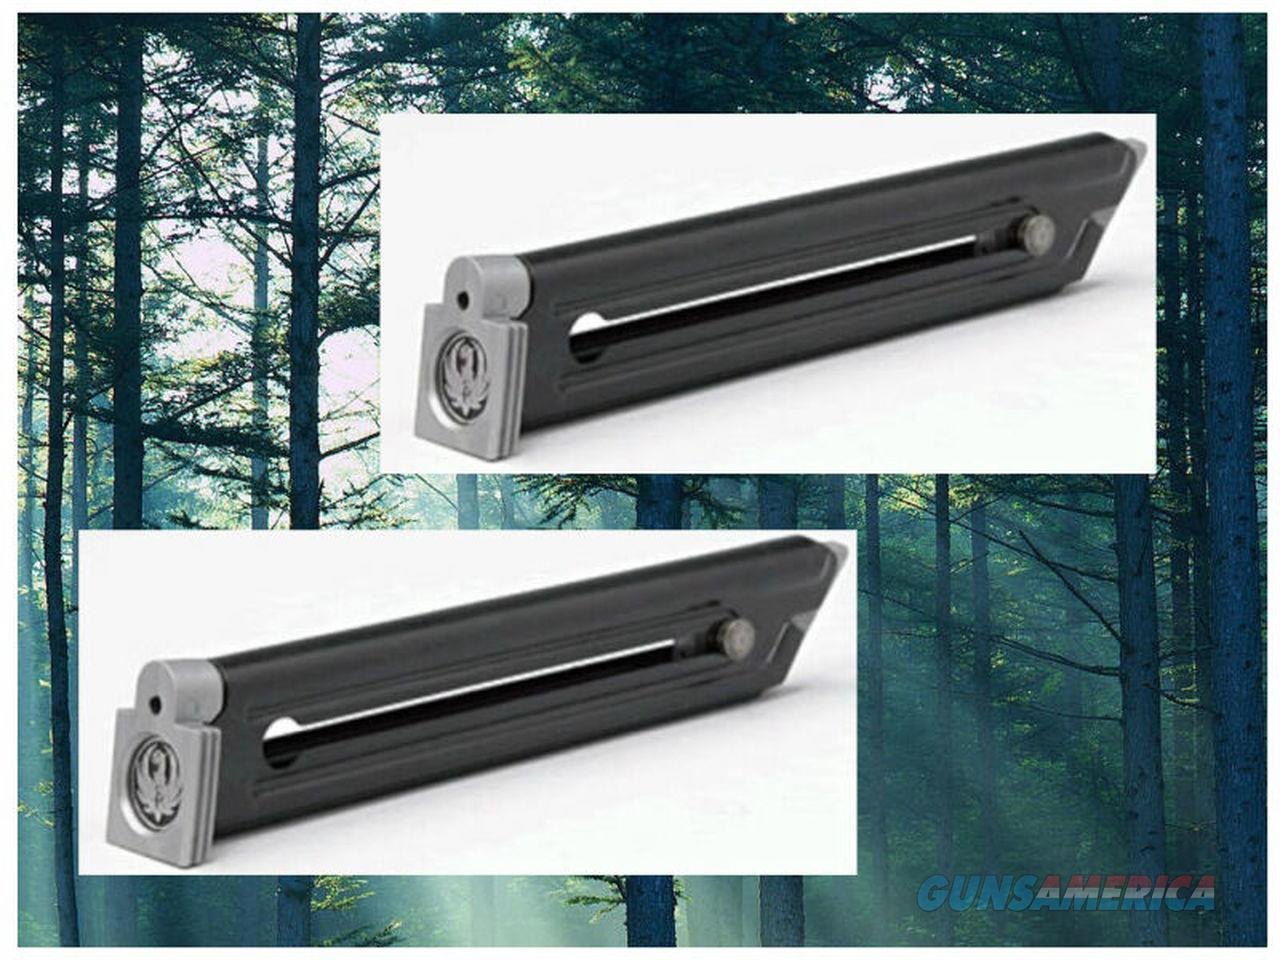 2 Pack Ruger Brand MARK 1 I 9rd Magazine .22lr 22 lr Mag Magazines MK 1 MKI MK 1  Non-Guns > Ammunition